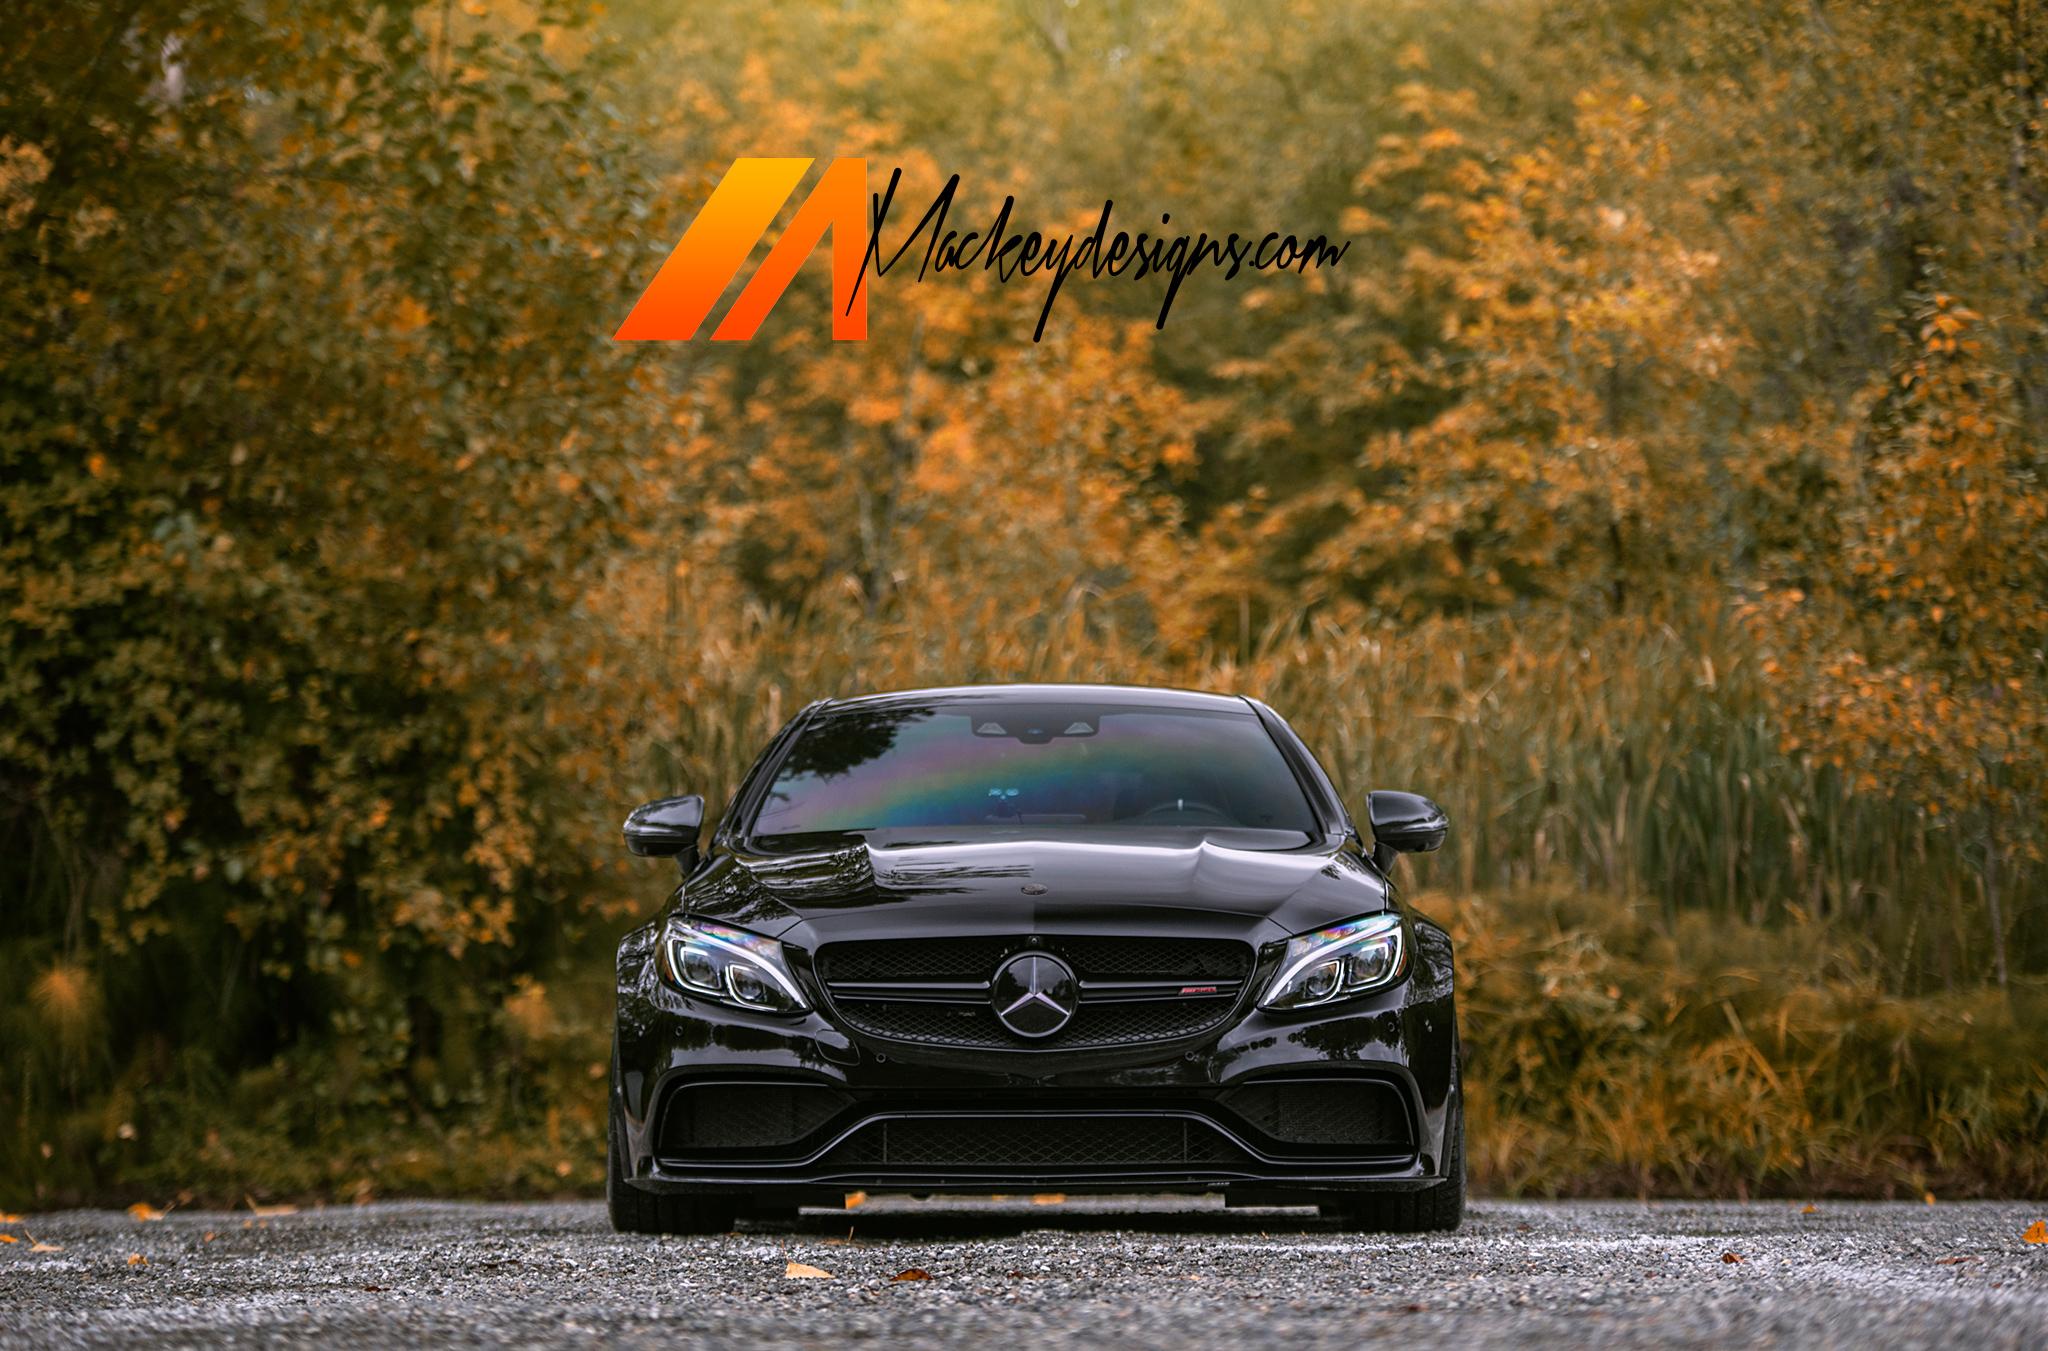 Mackeydesigns_Mercedes_C63S-15.jpg